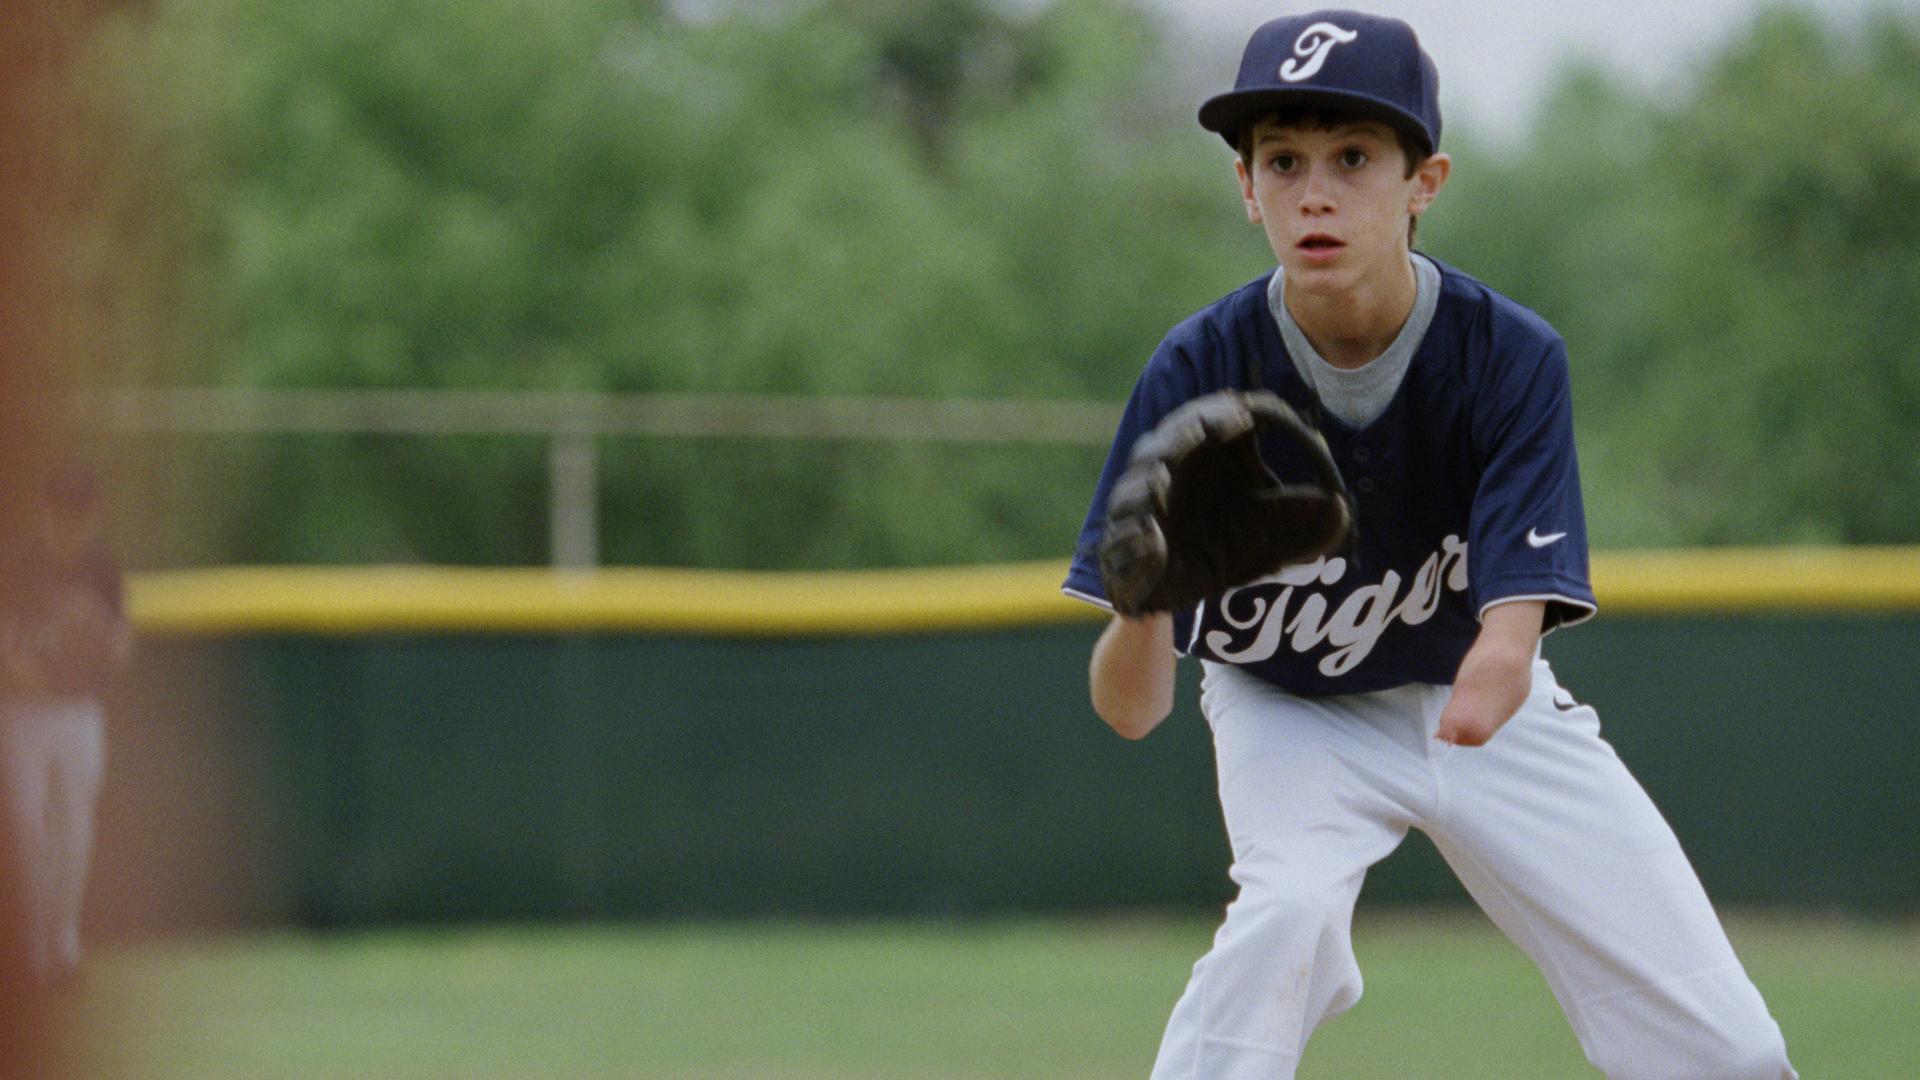 Thumbnail for Greatness Baseball